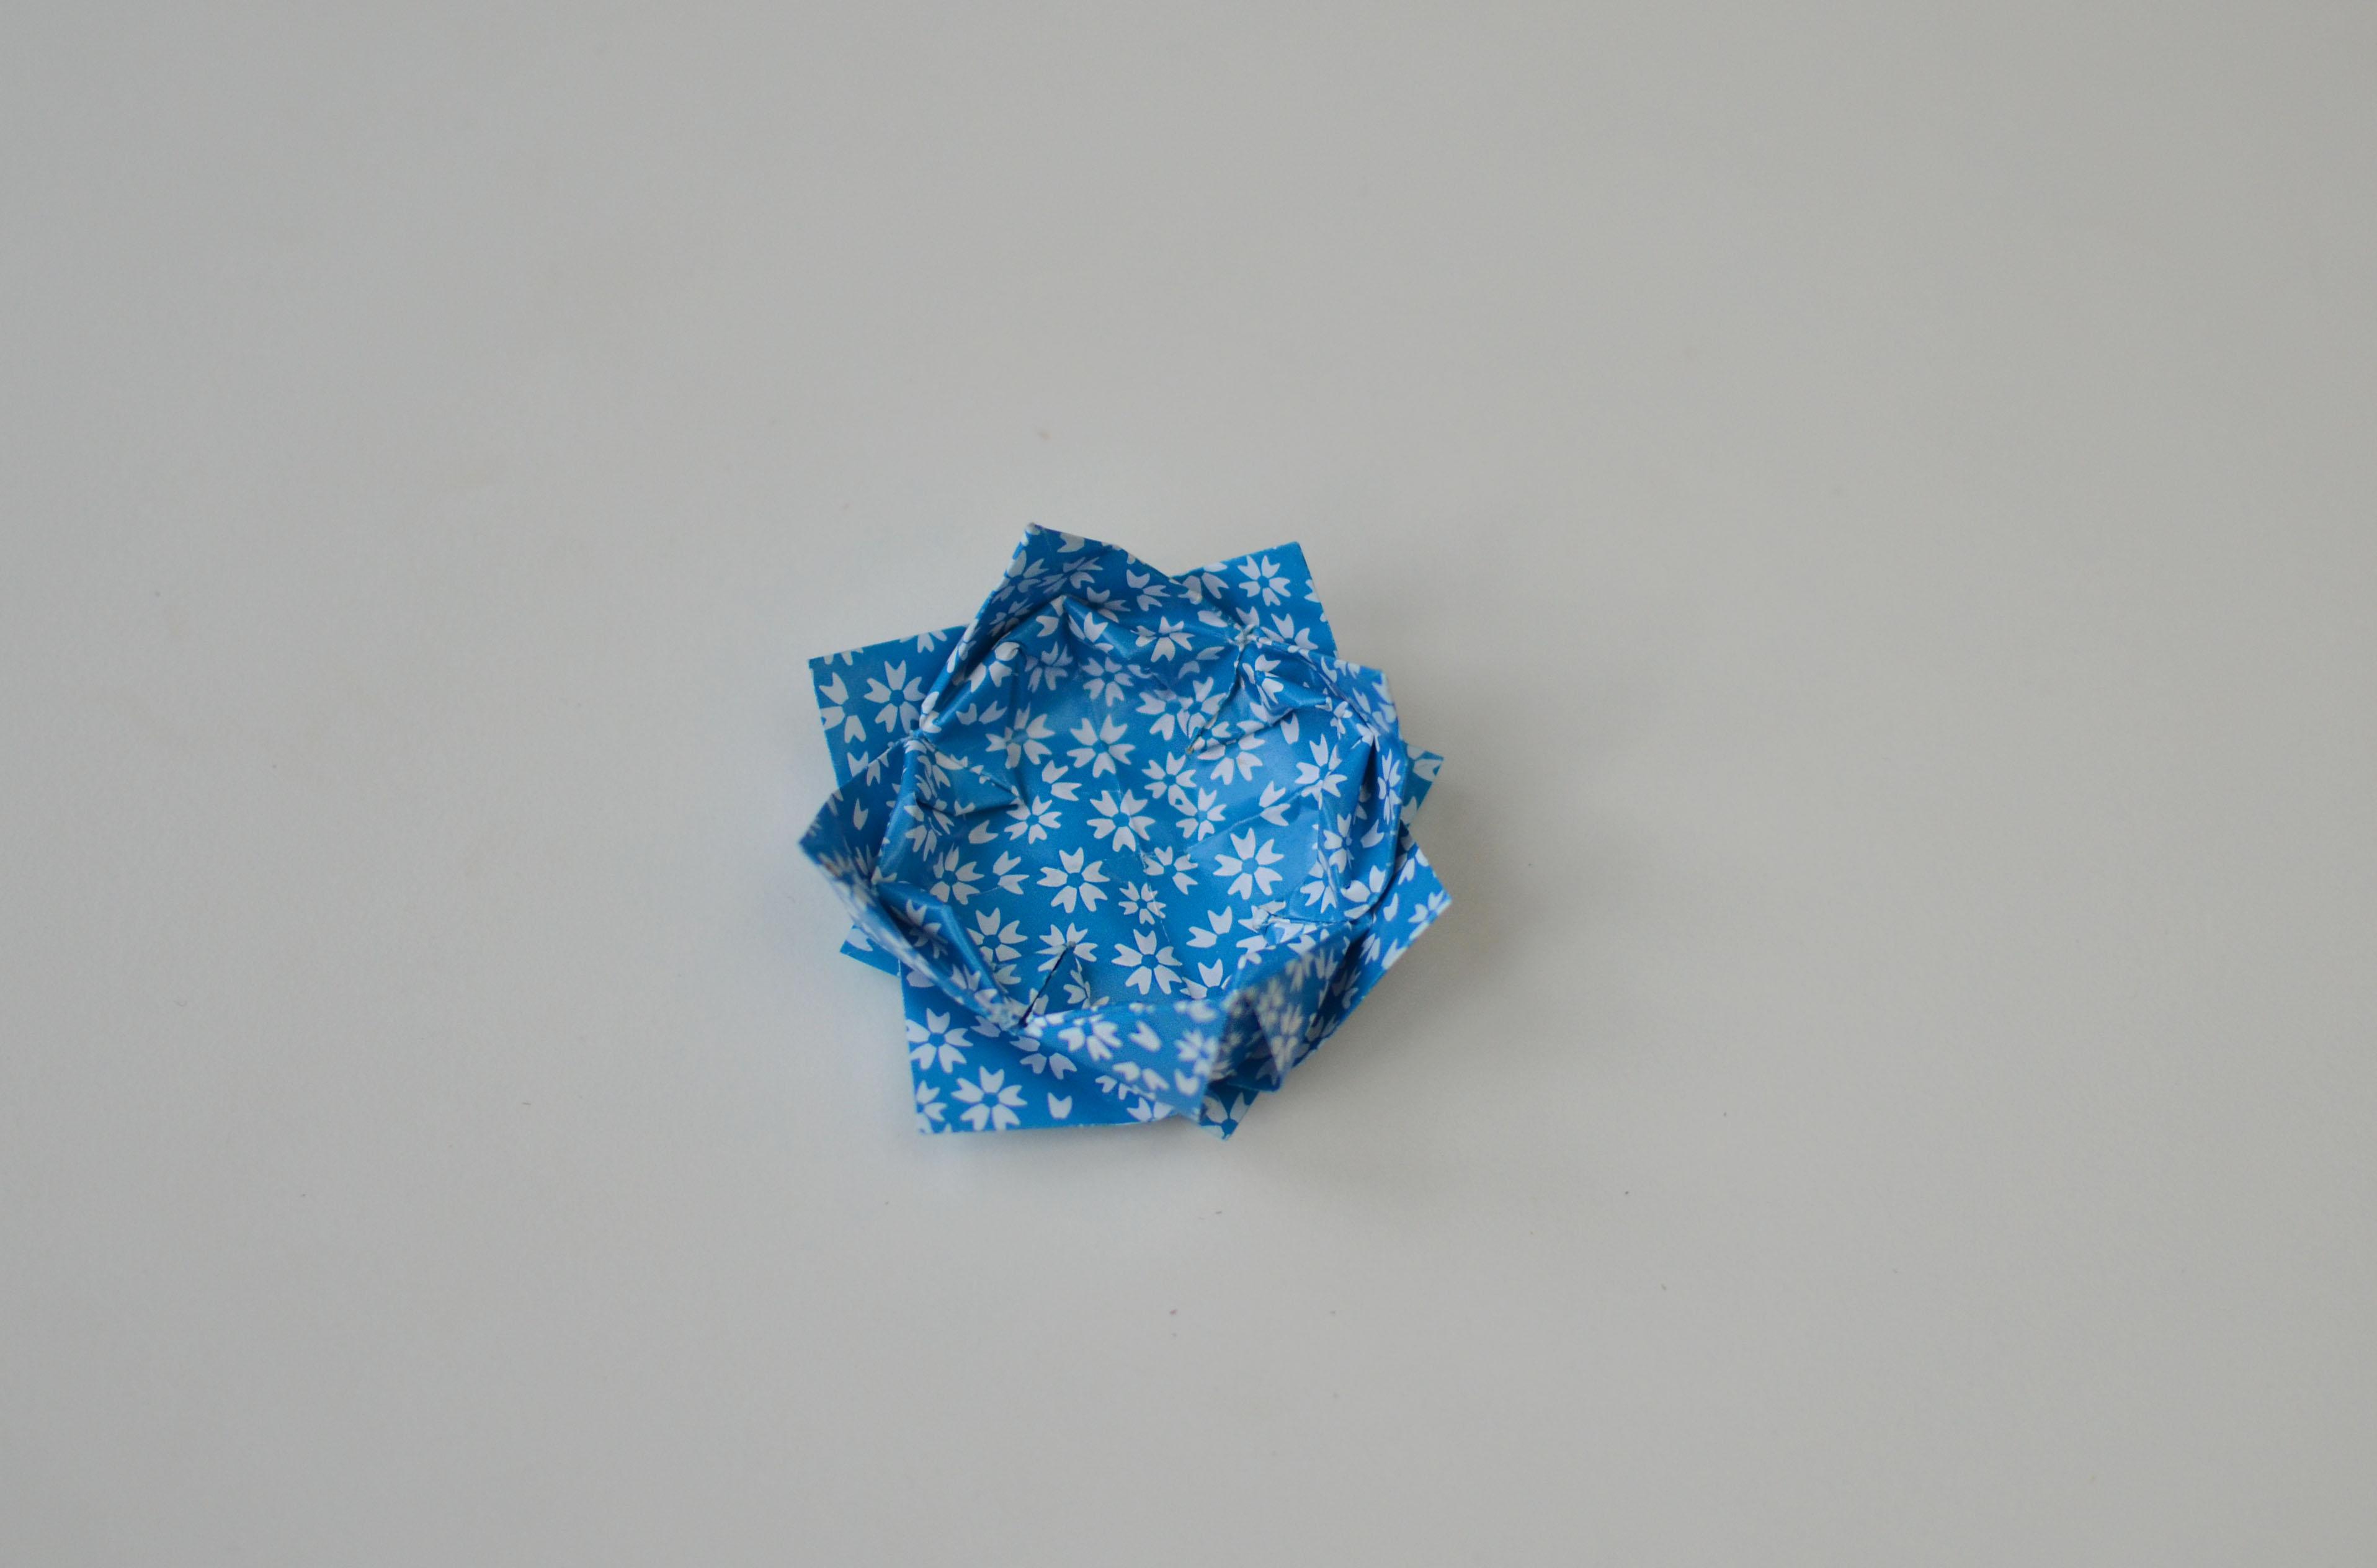 braincrafts_final_lotus_origami_product.jpg